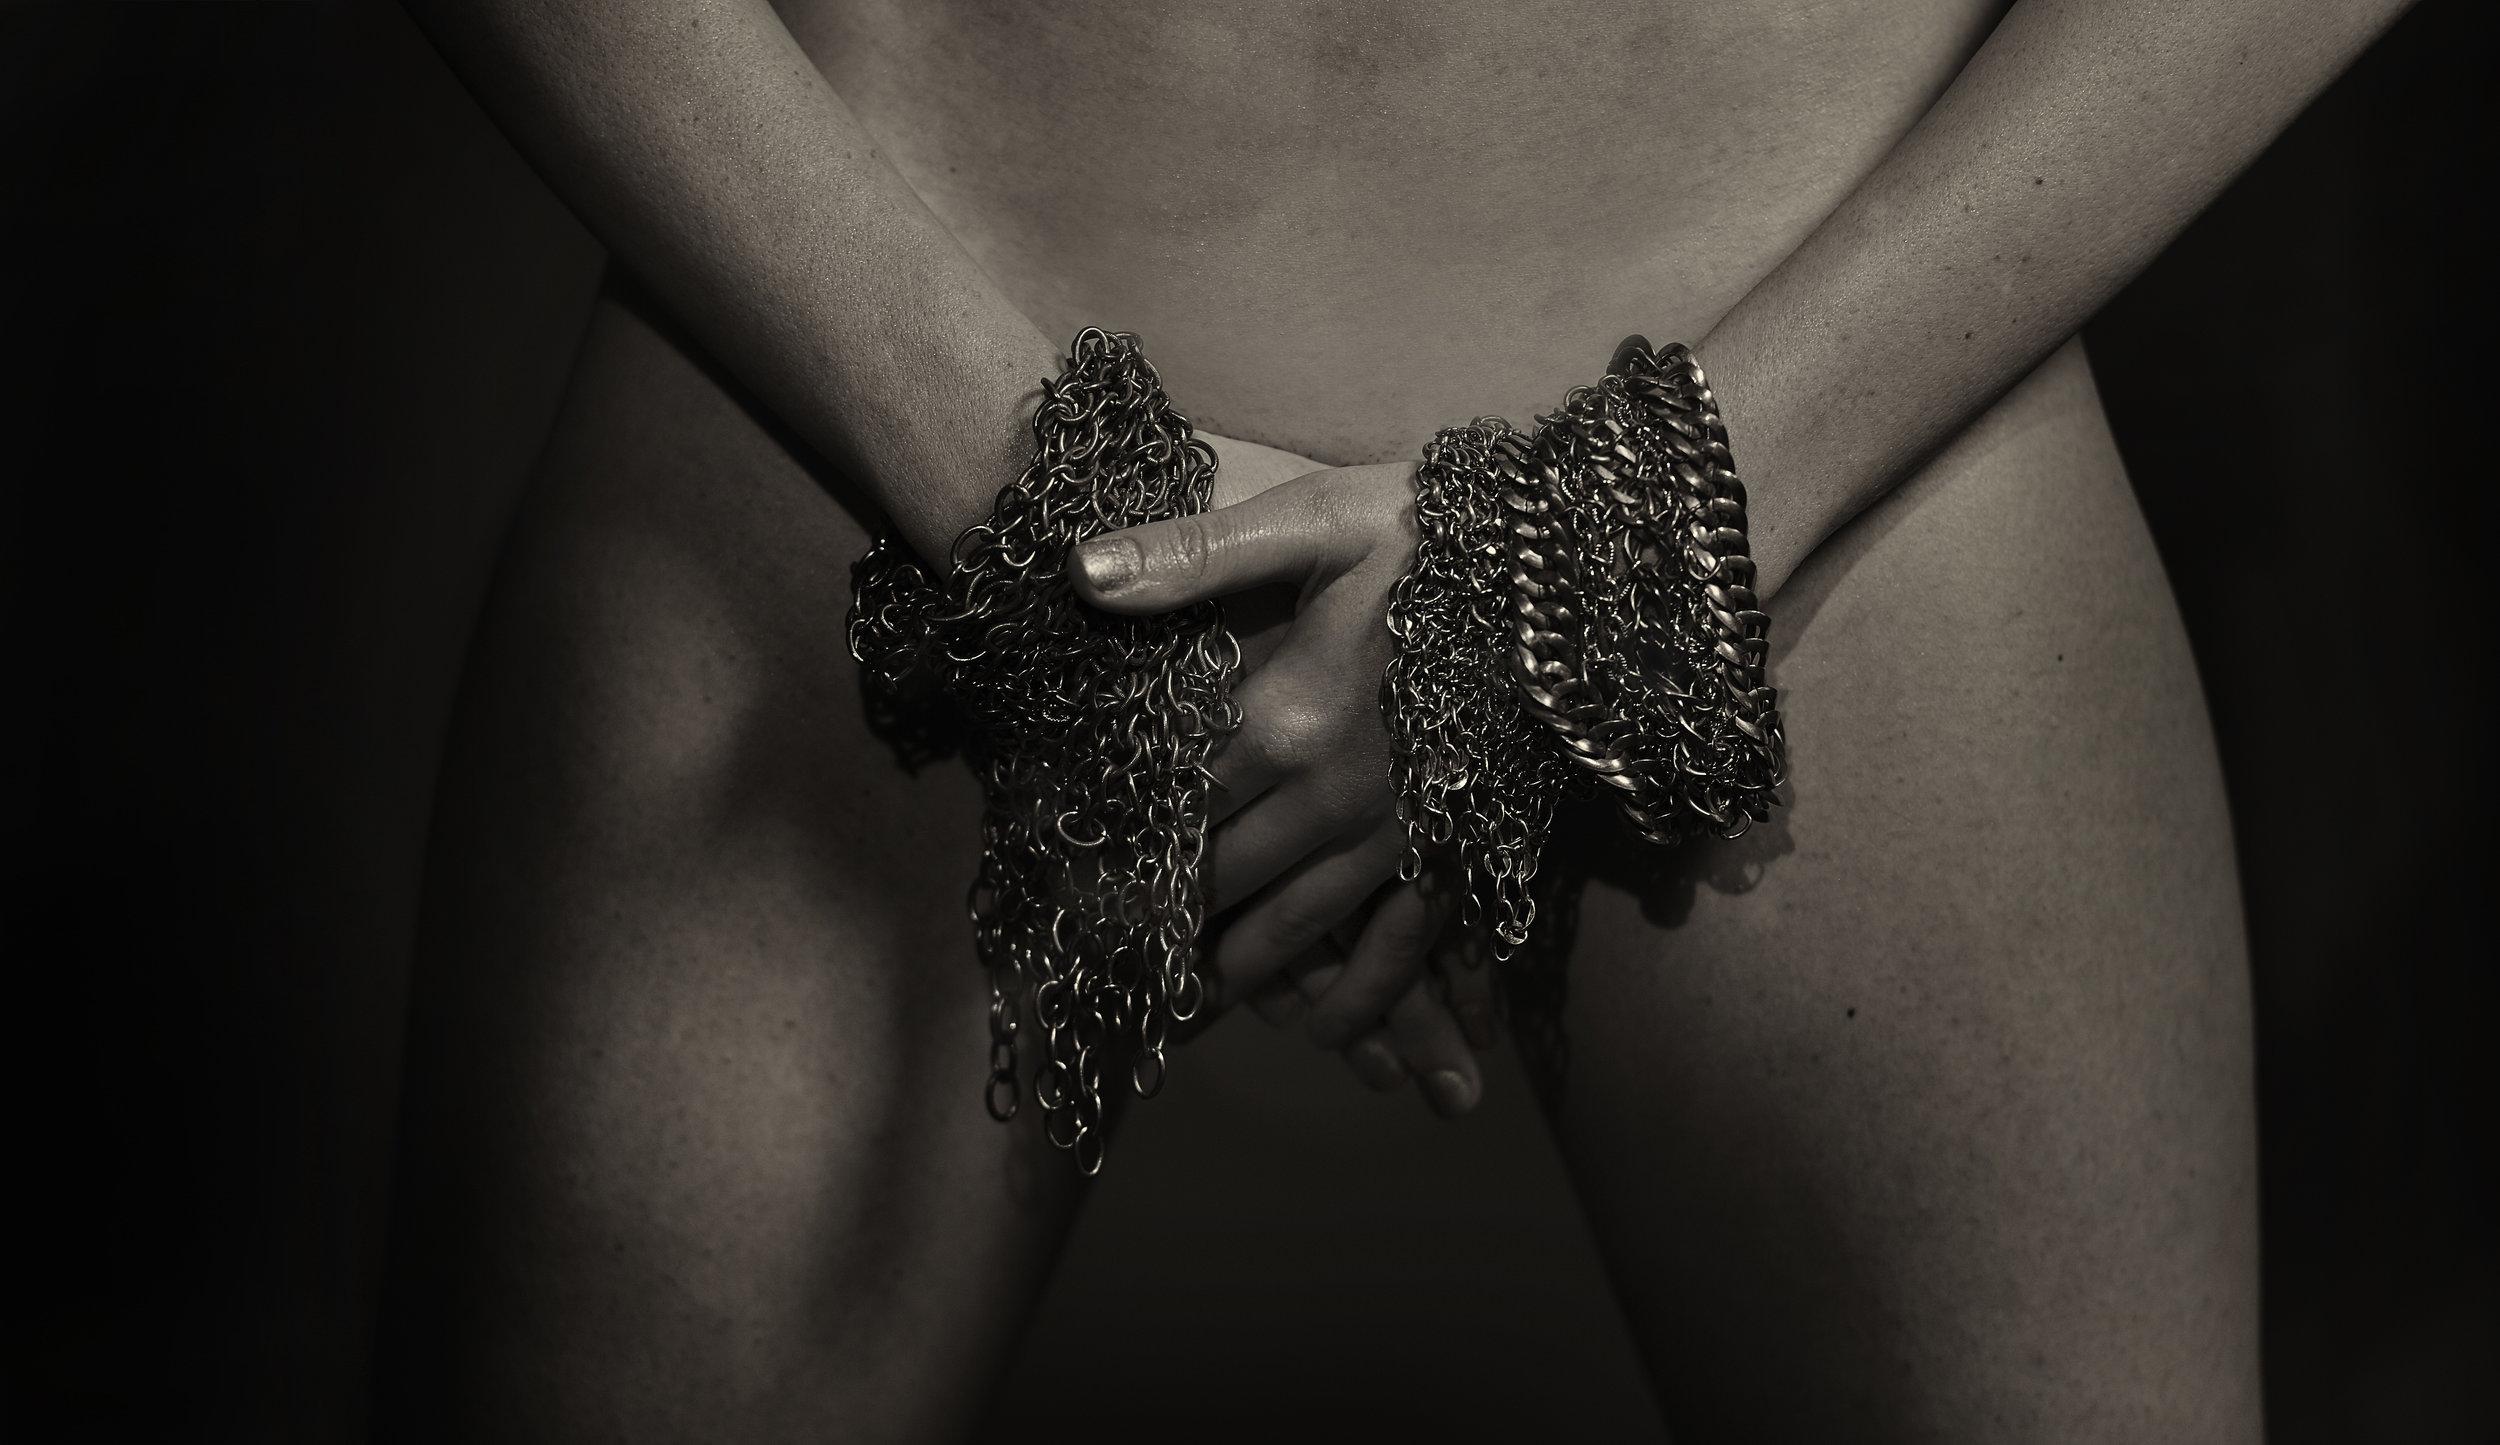 Fays_Chains_20530.jpg